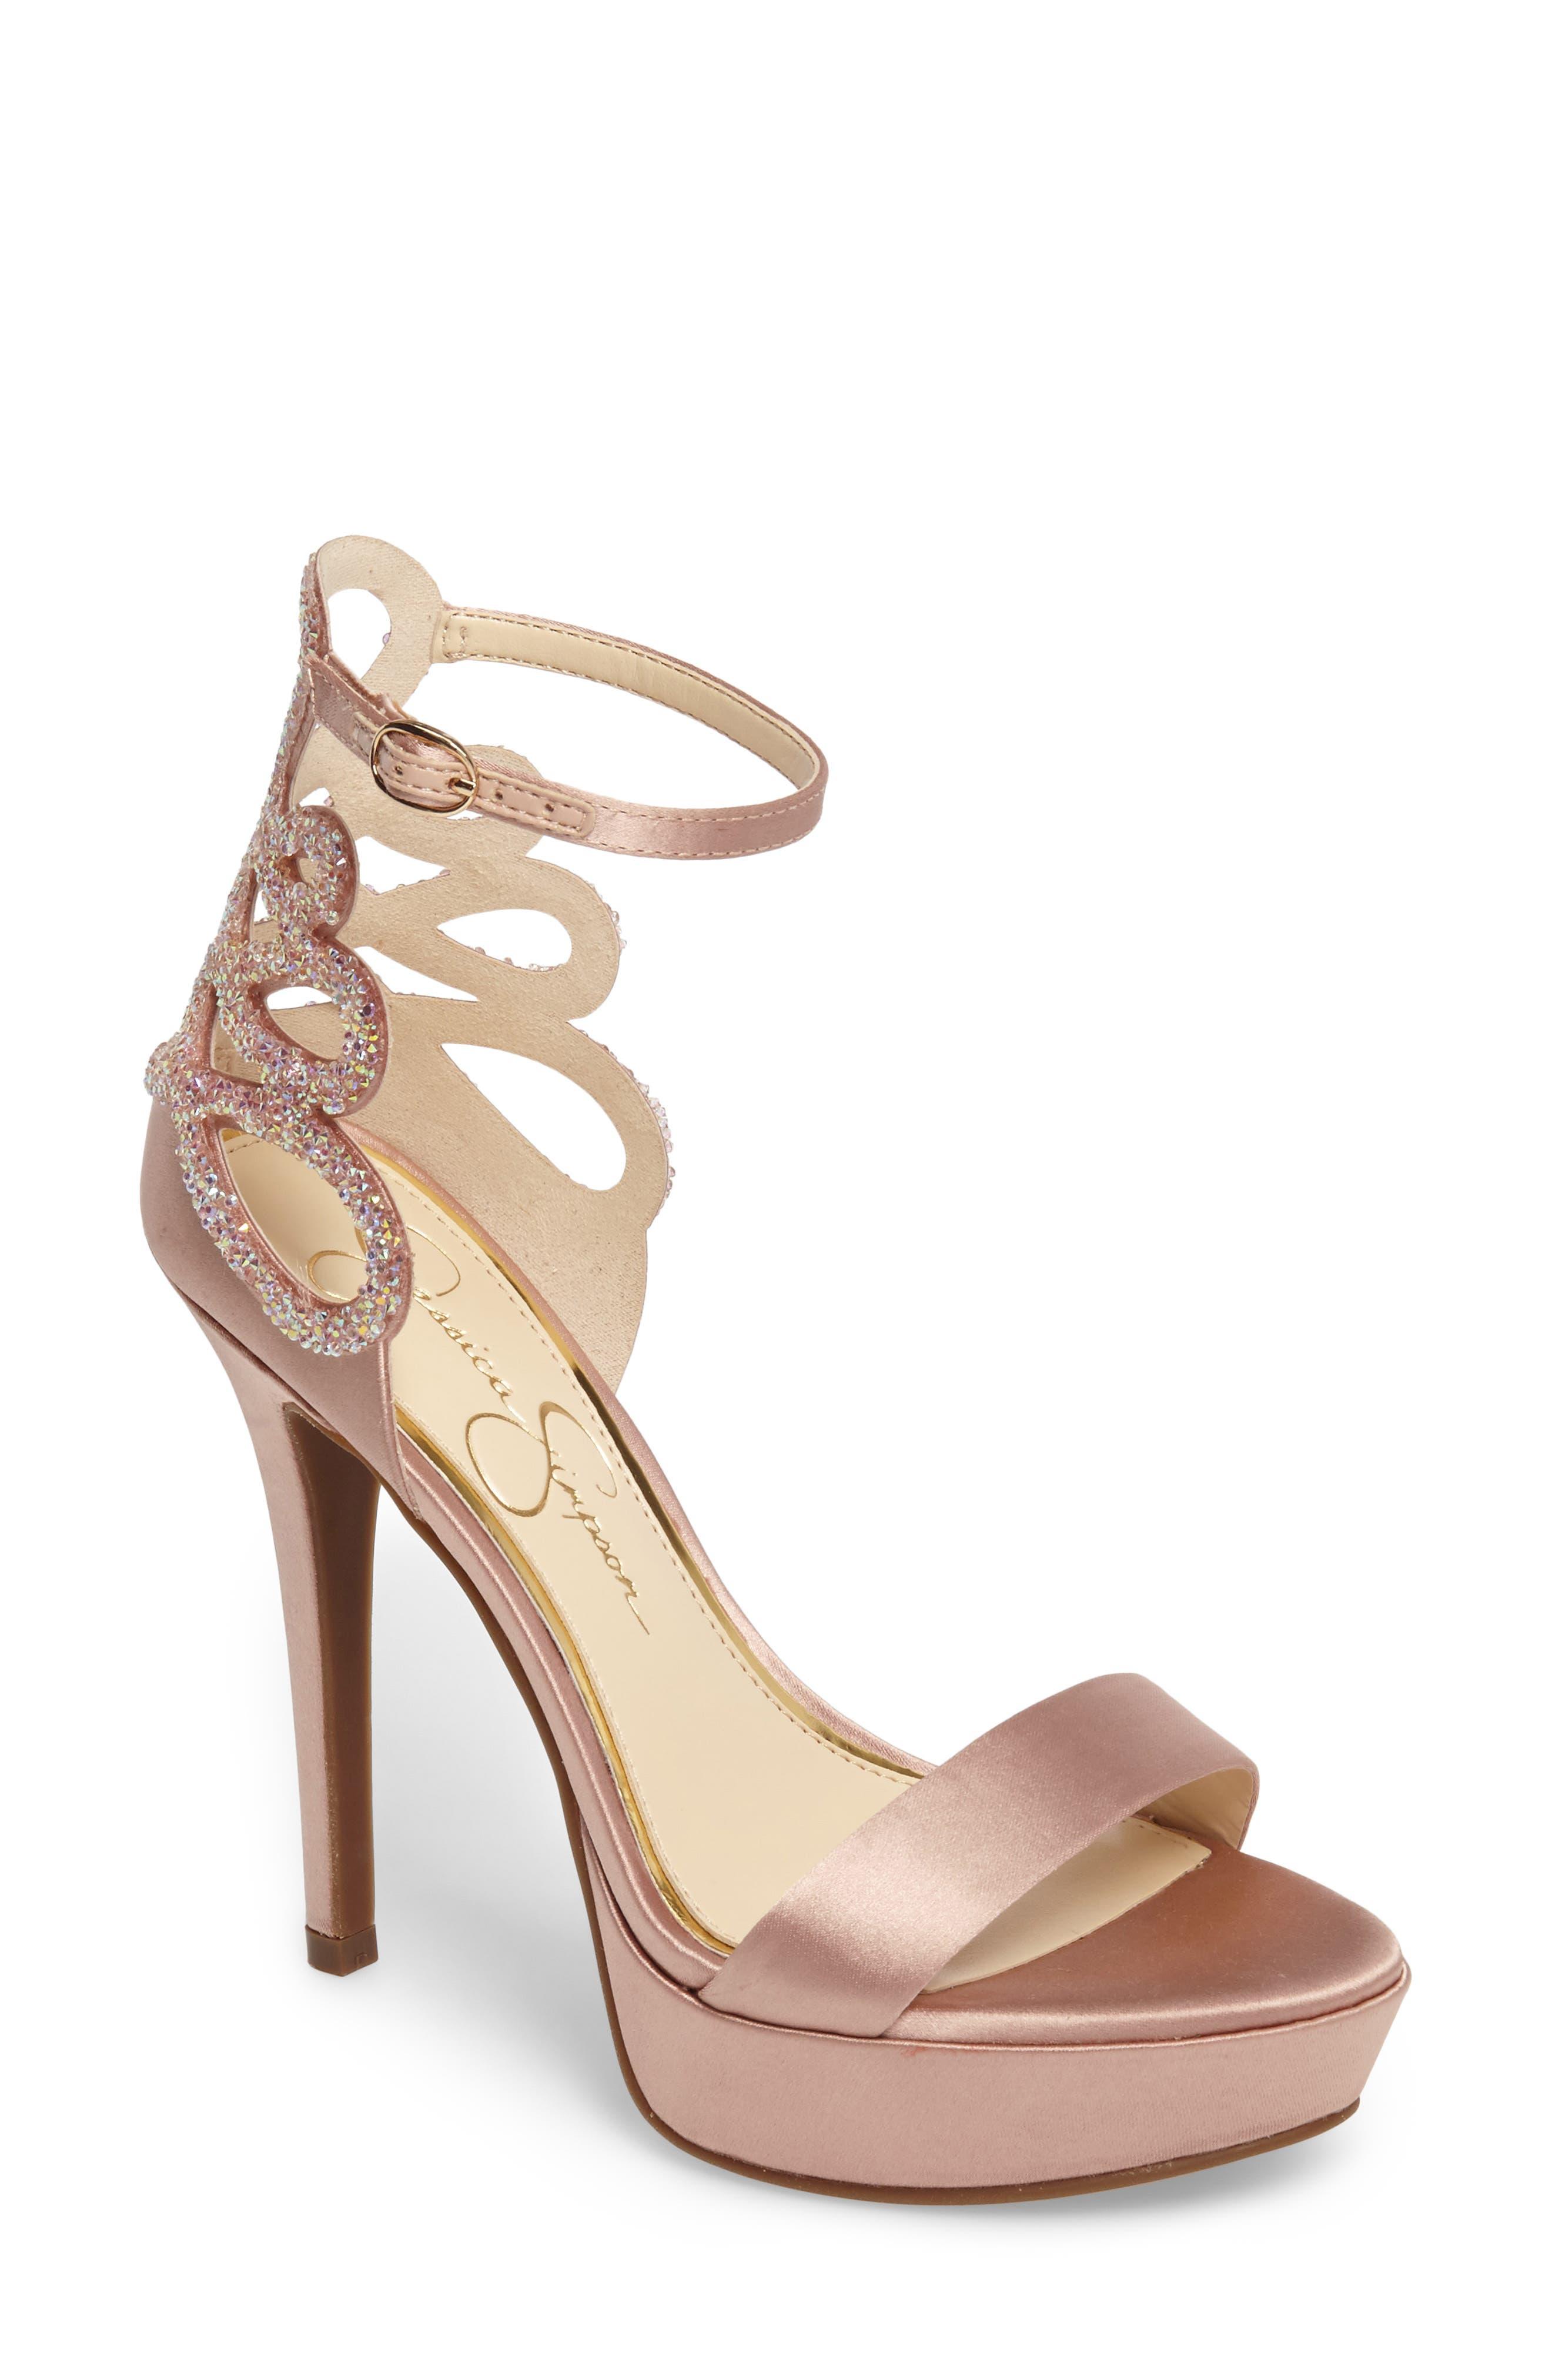 Main Image - Jessica Simpson Bayvinn Platform Sandal (Women)